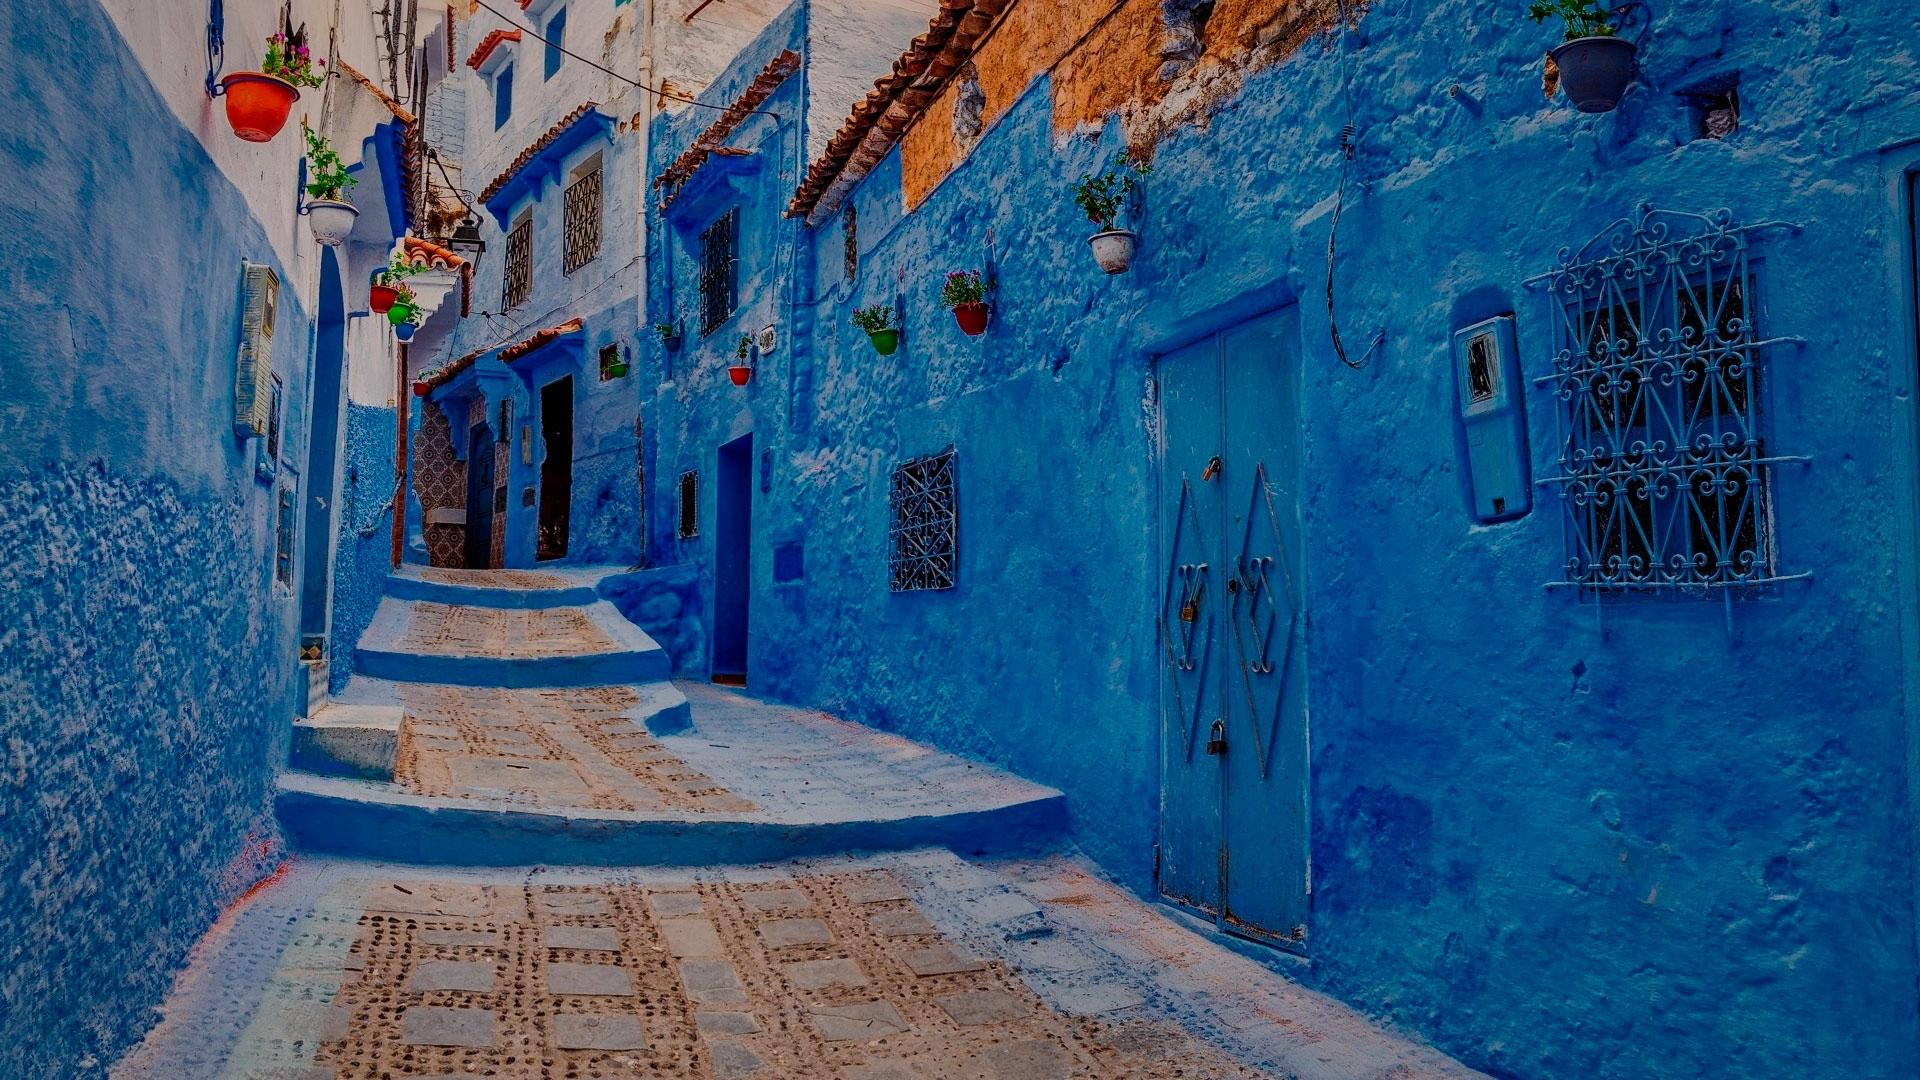 https://www.centraldevacaciones.pt/viajes/assets/upload/c1.jpg